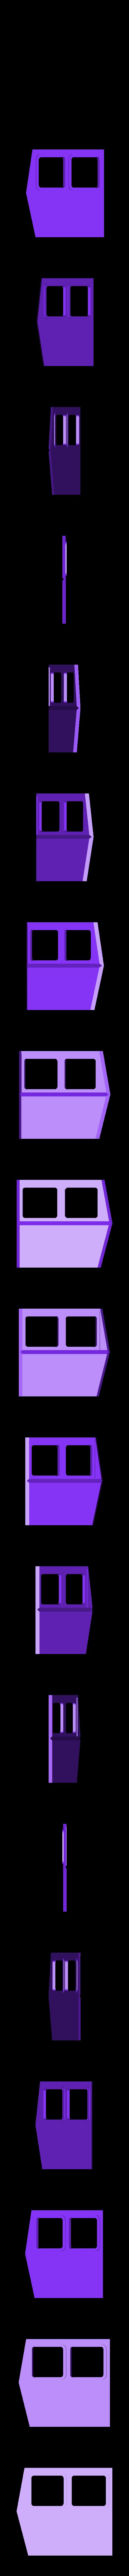 G lateral cabine.STL Download STL file Draisine Matisa for LGB • 3D printable object, biddle